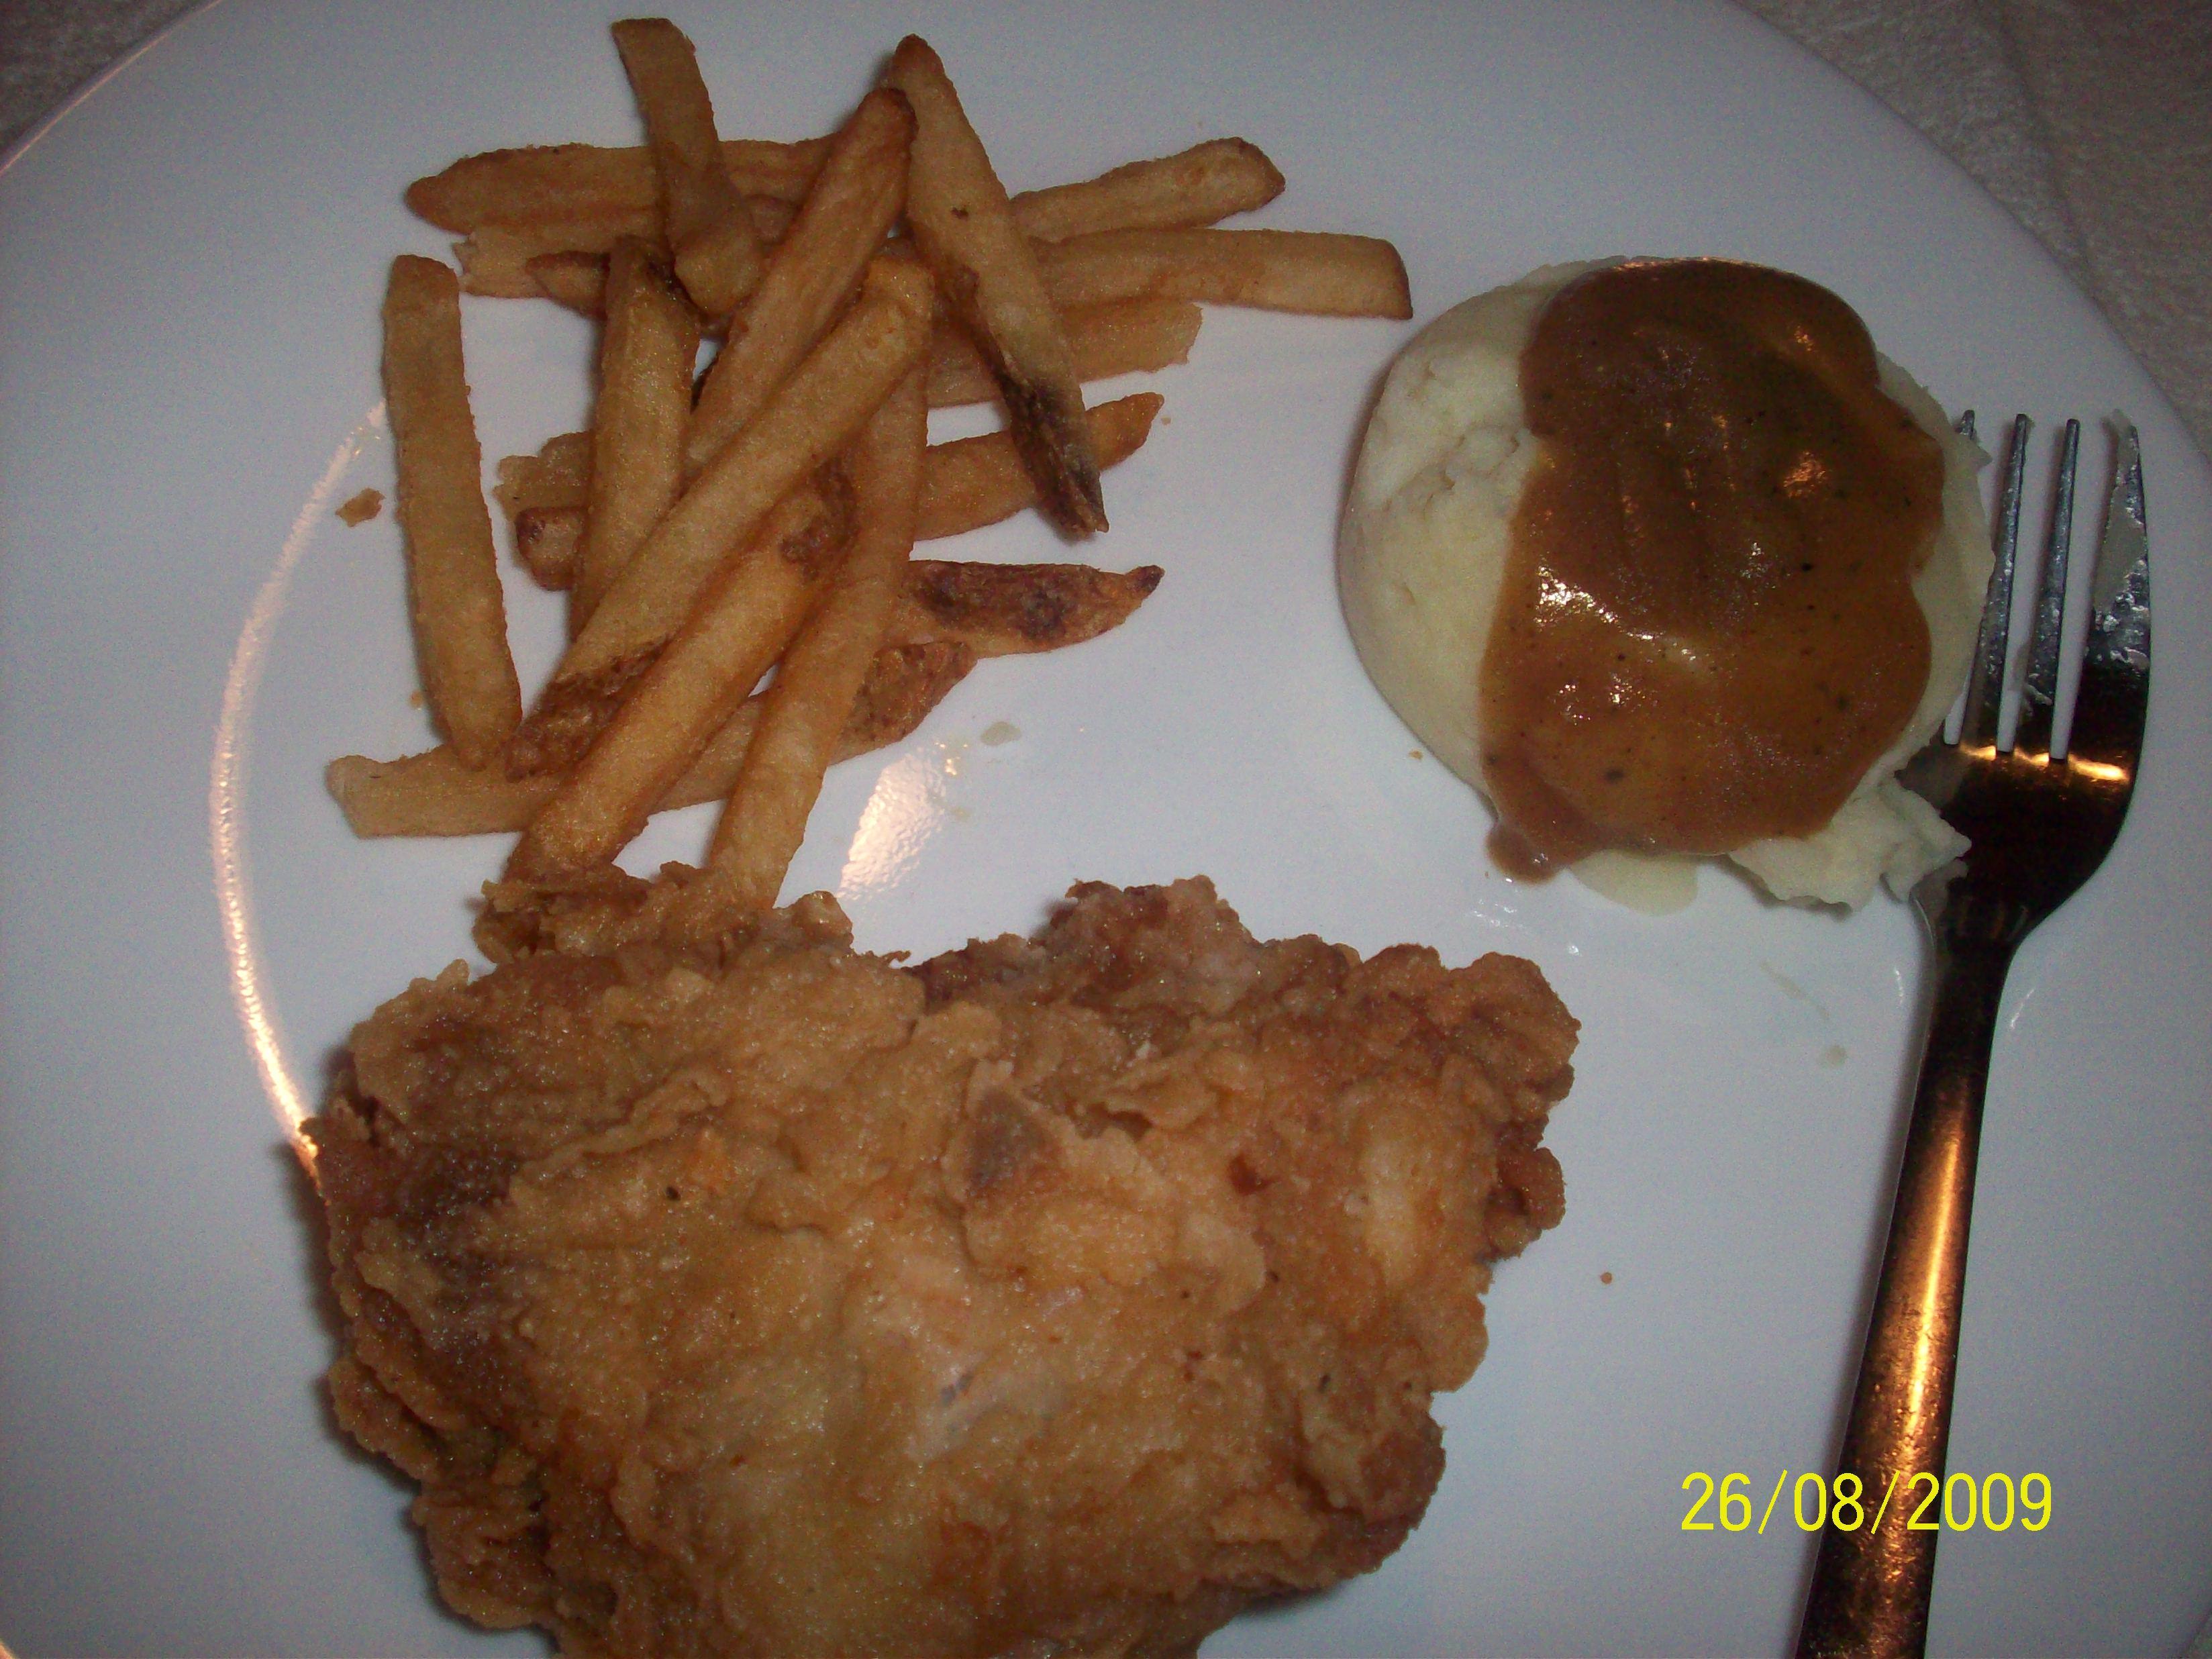 https://foodloader.net/cutie_2009-08-26_KFC_Chicken__Fries_and_Mashed_Potato.jpg